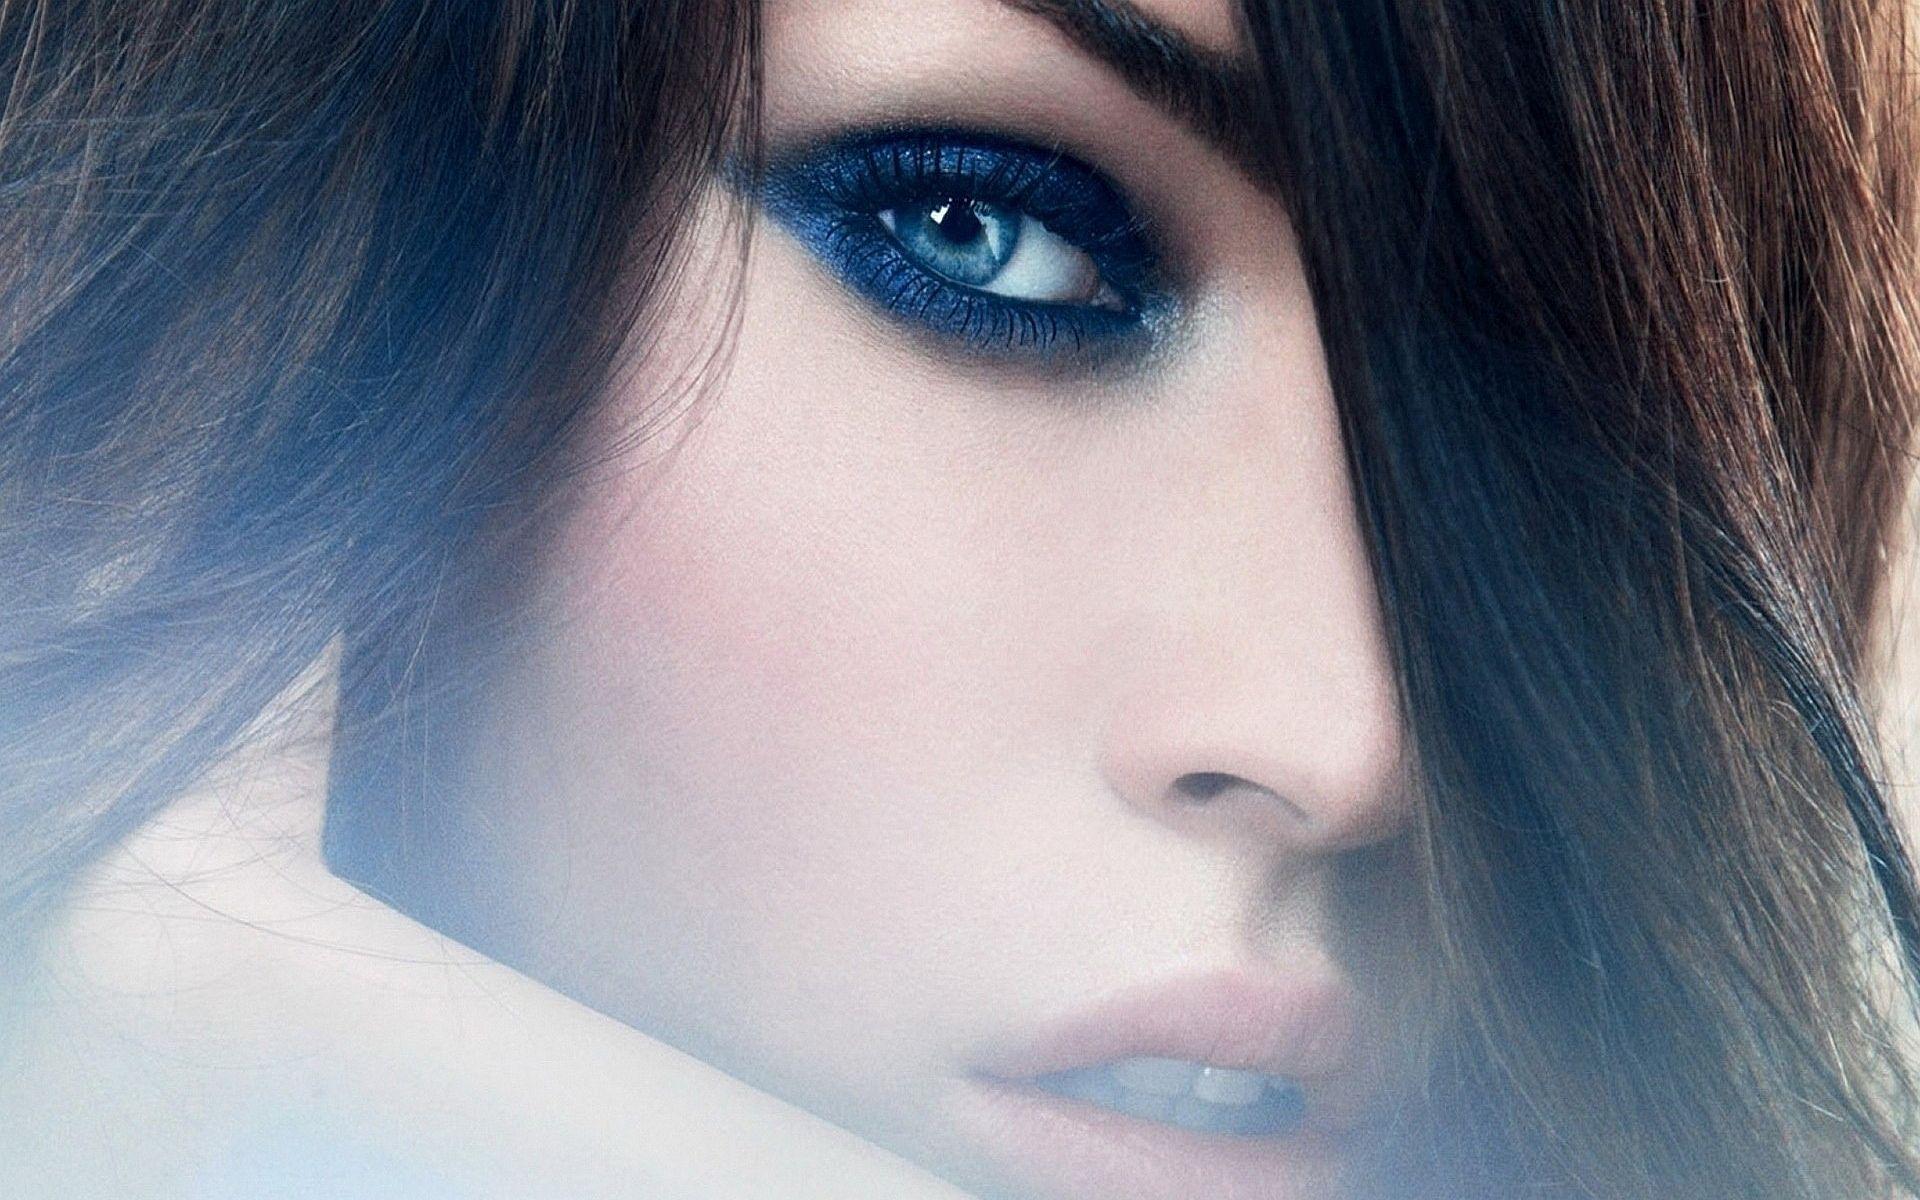 http://2.bp.blogspot.com/-RjNZL9-eV3E/ULBpB9nA5BI/AAAAAAAANik/FgTKOV3eUm8/s1920/megan-fox-blue-eyes-wallpaper.jpg